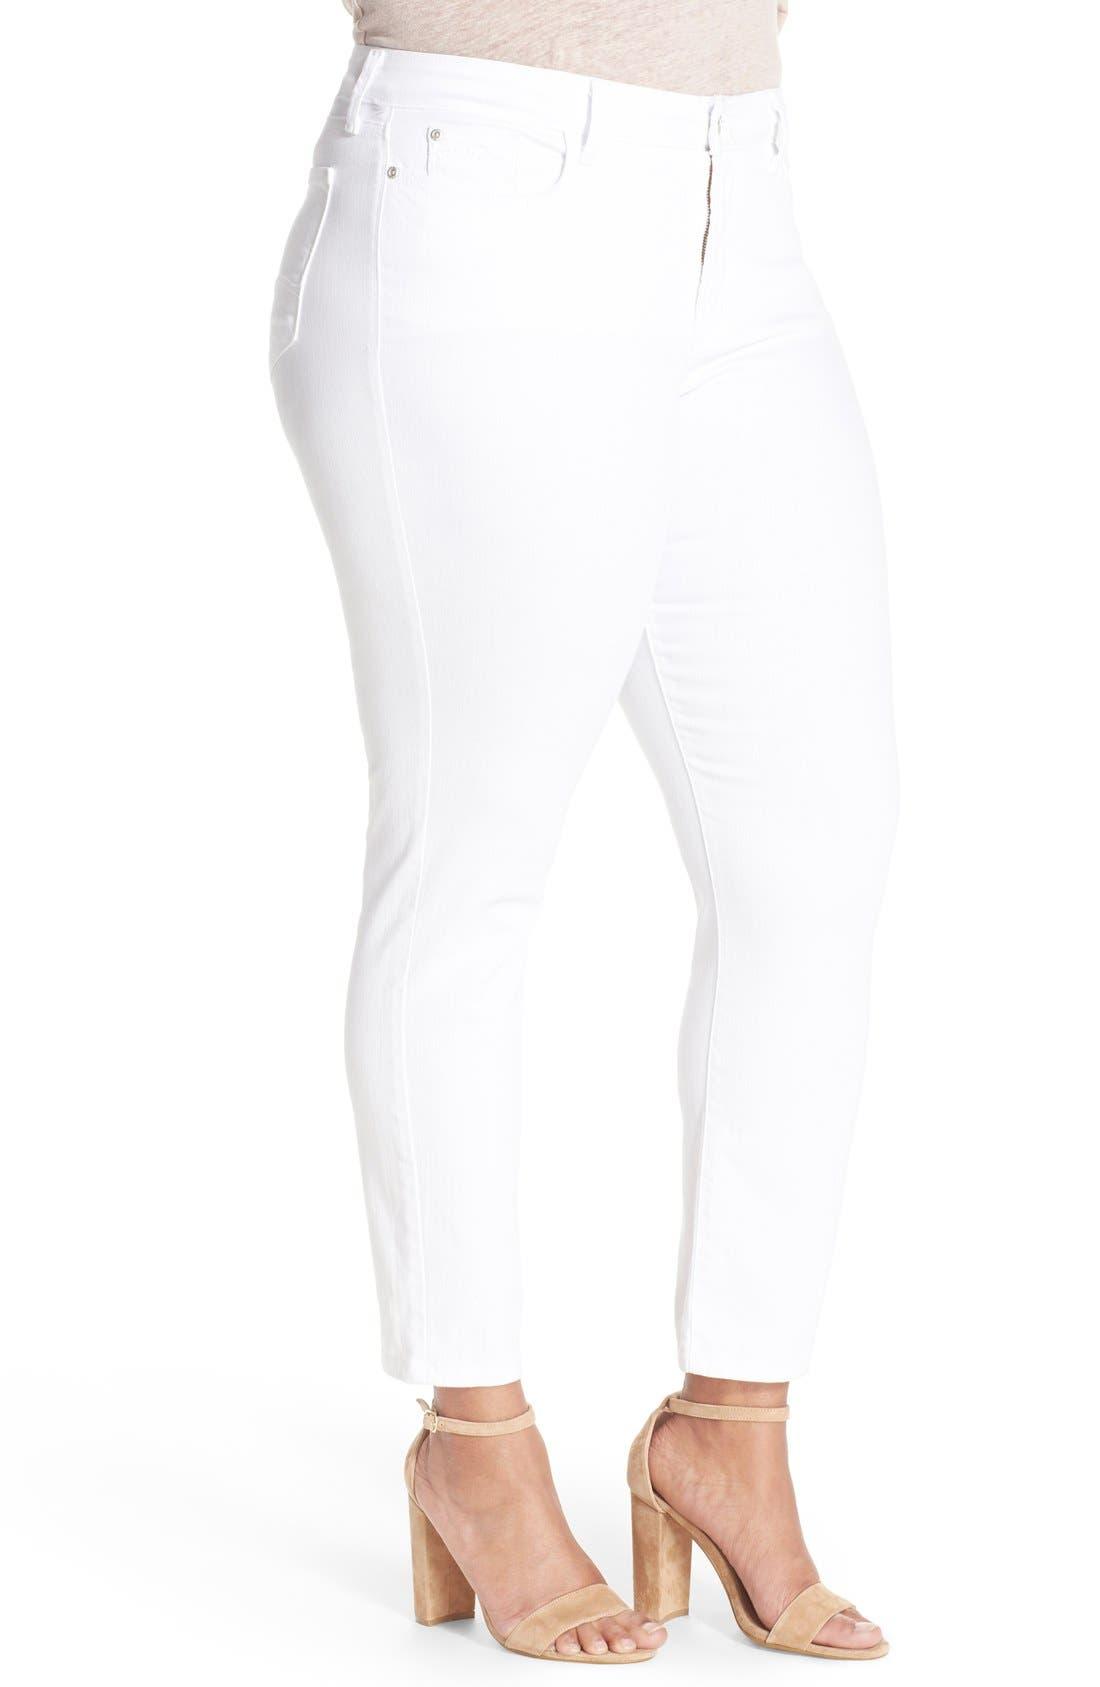 Alternate Image 3  - NYDJ 'Clarissa' Stretch Slim Ankle Jeans (Plus Size)